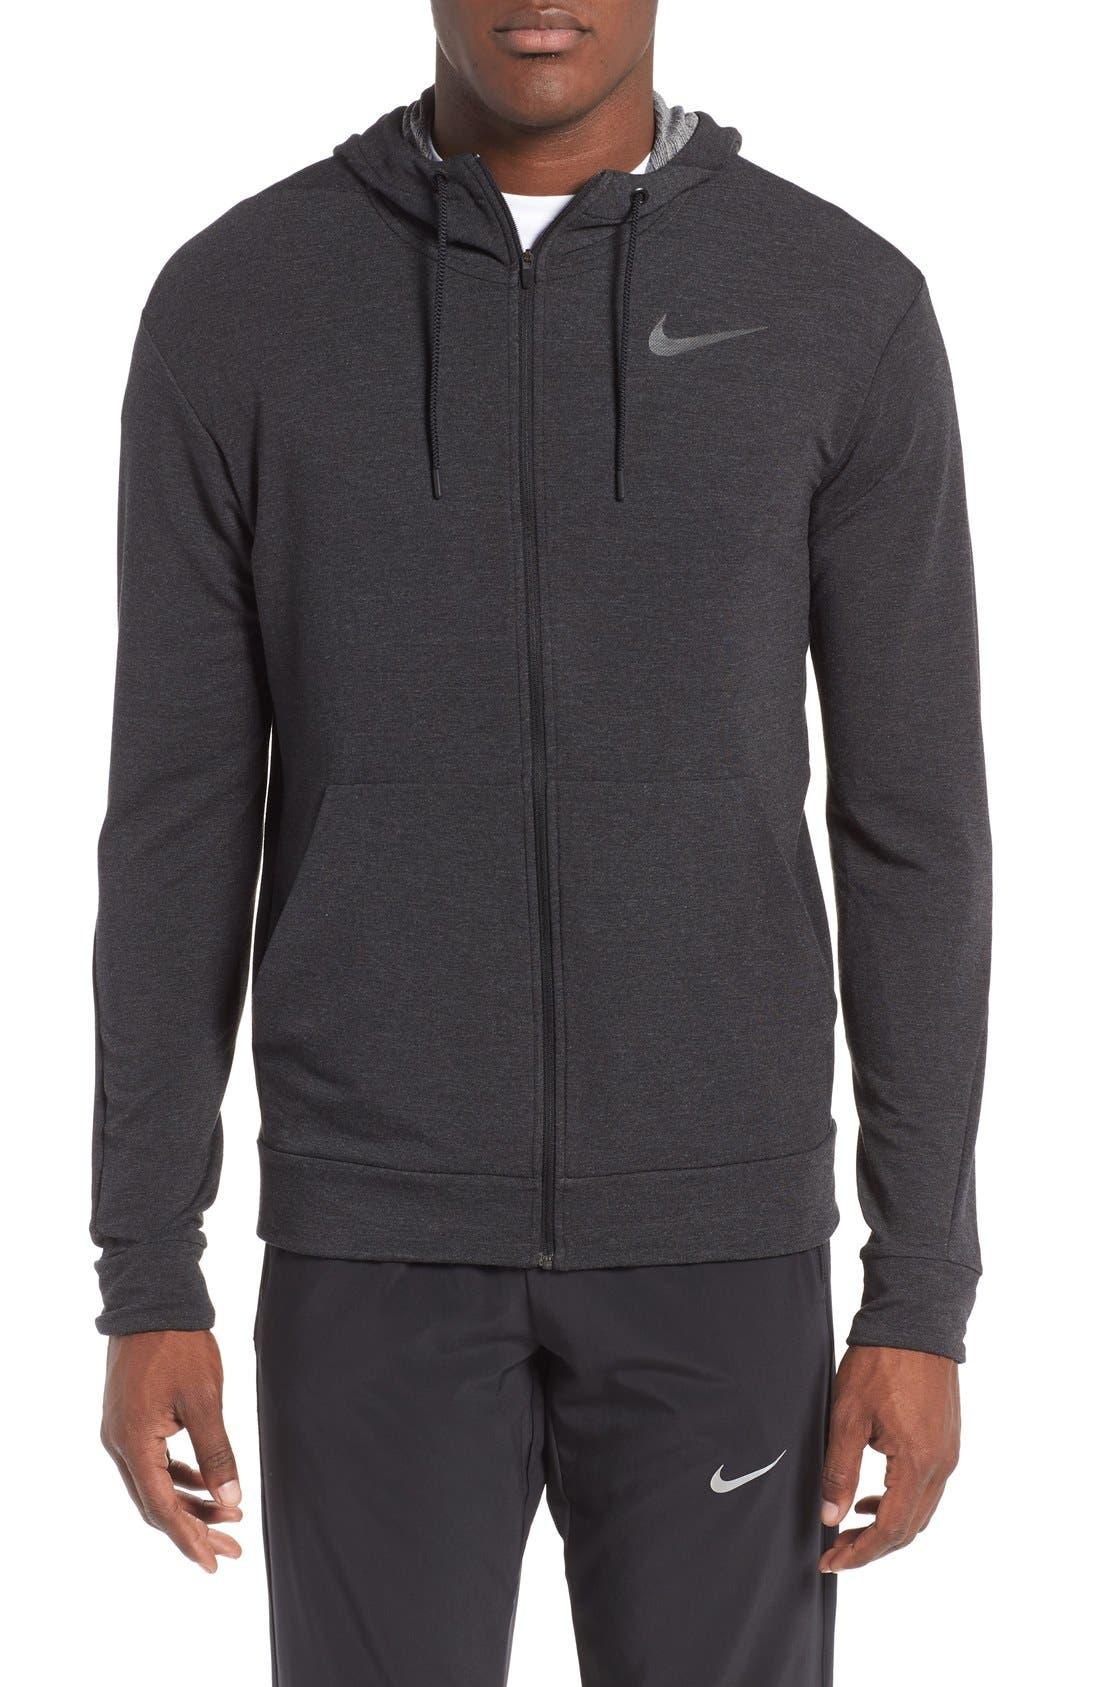 Main Image - Nike Dri-Fit Training Fleece Hooded Sweatshirt